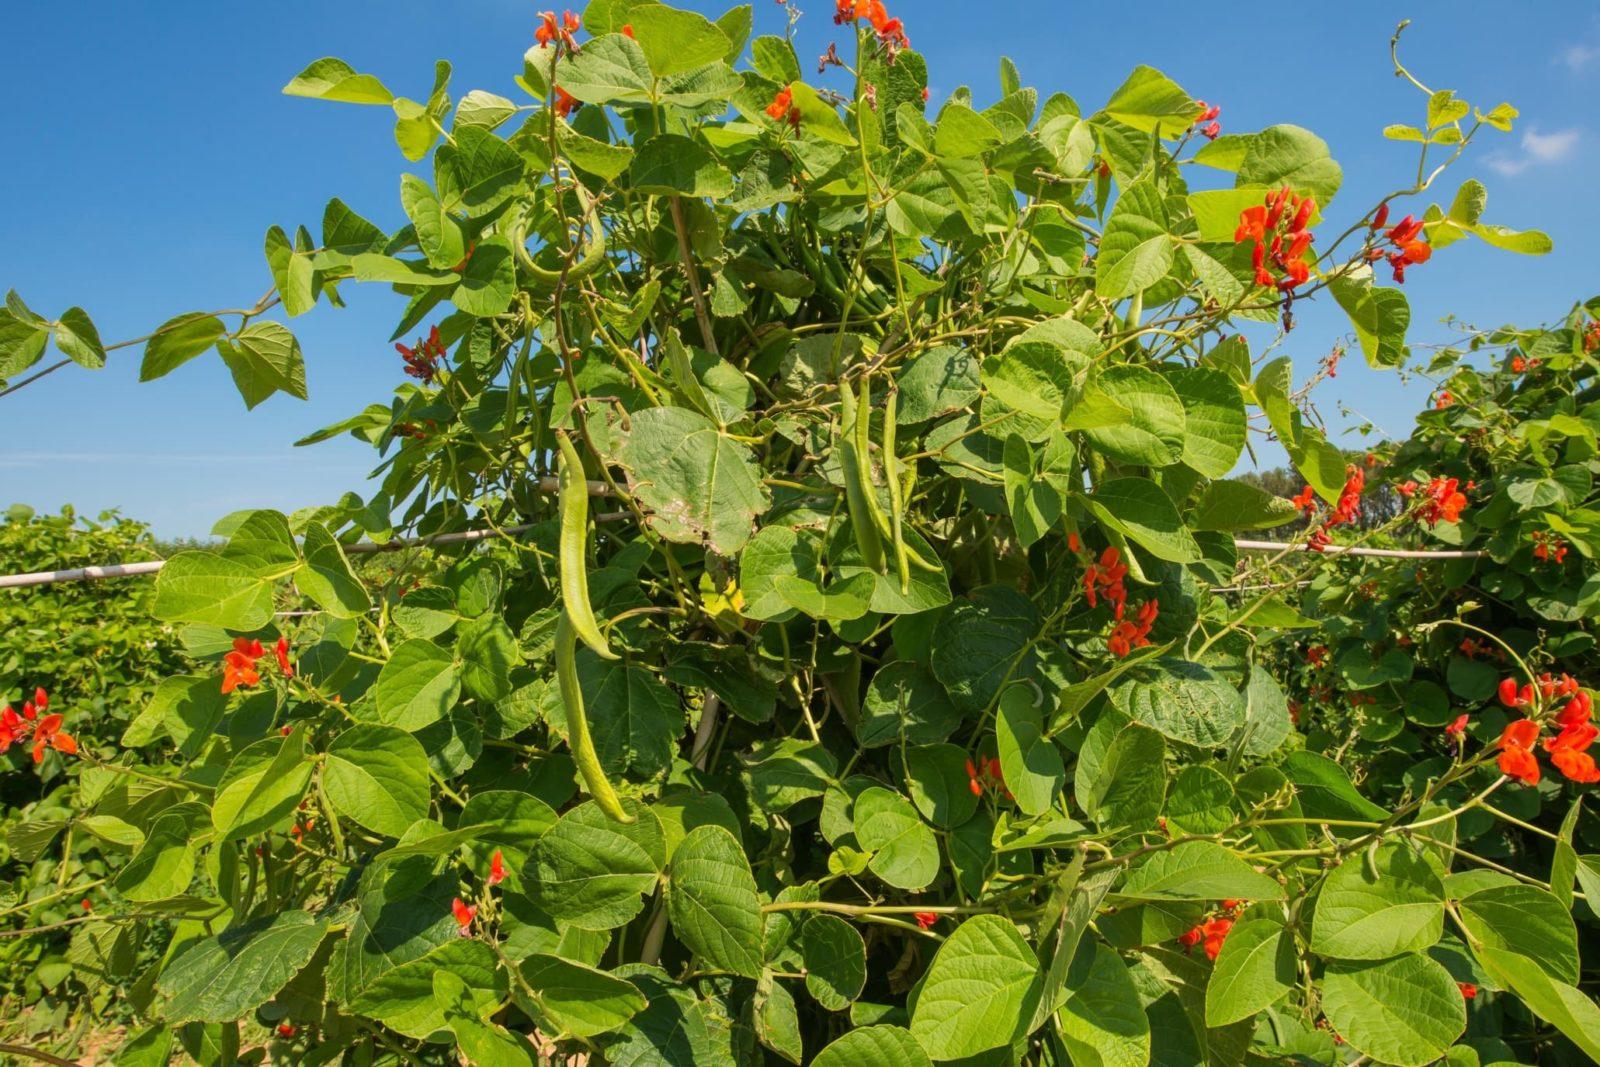 runner beans growing in an English field